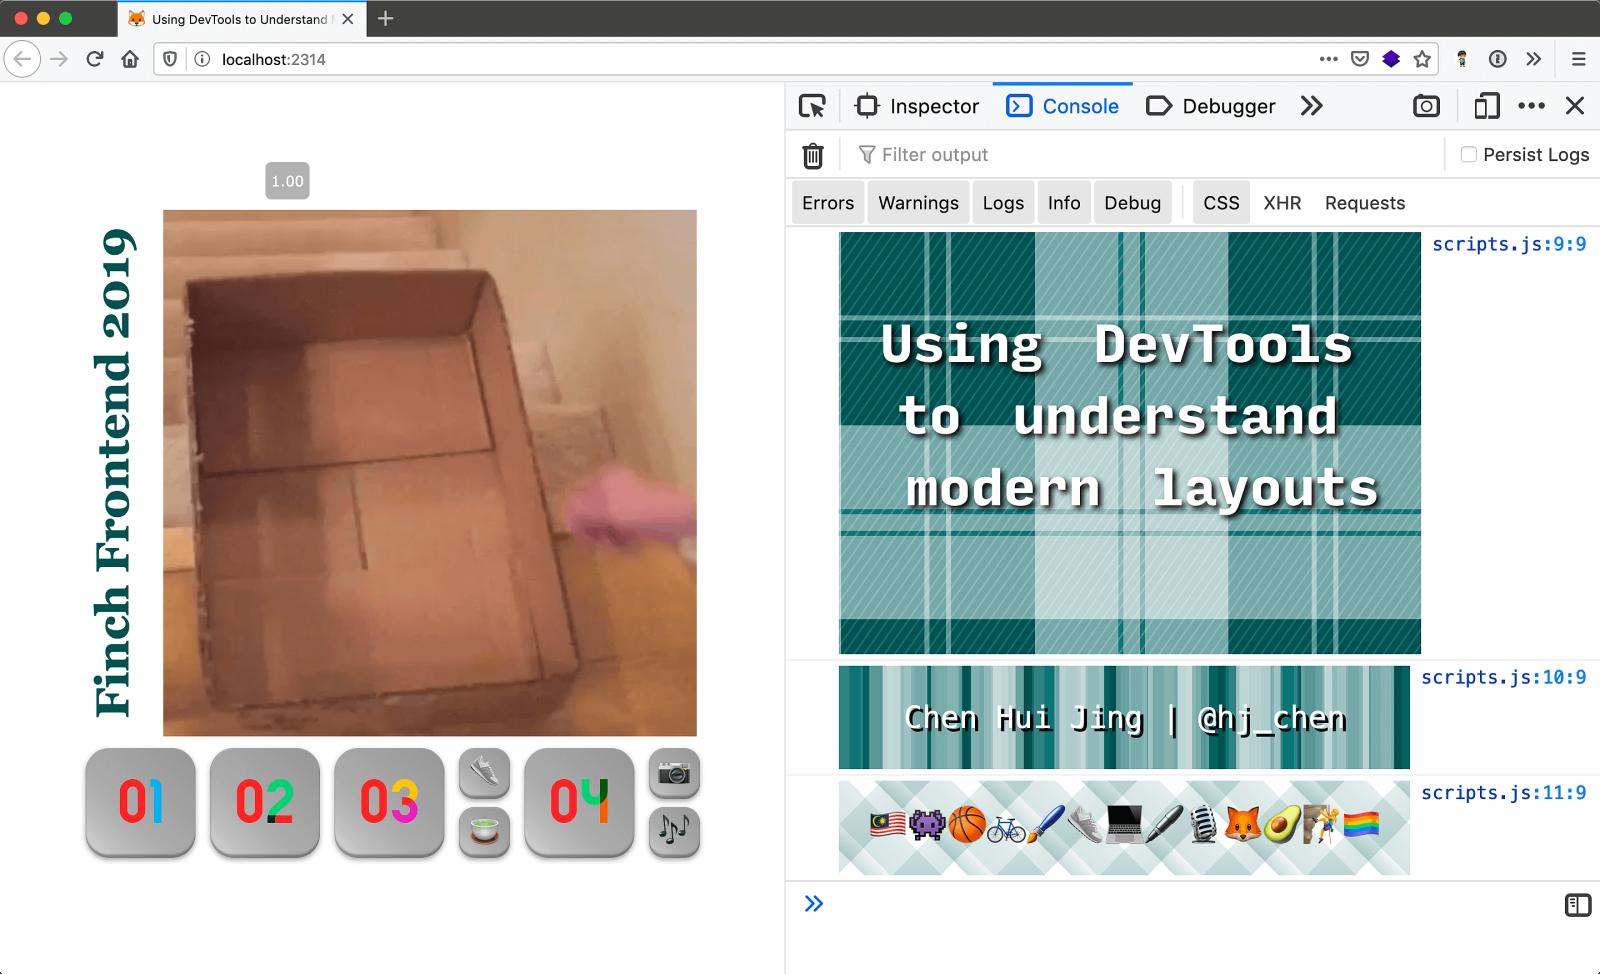 Using DevTools to understand modern layouts